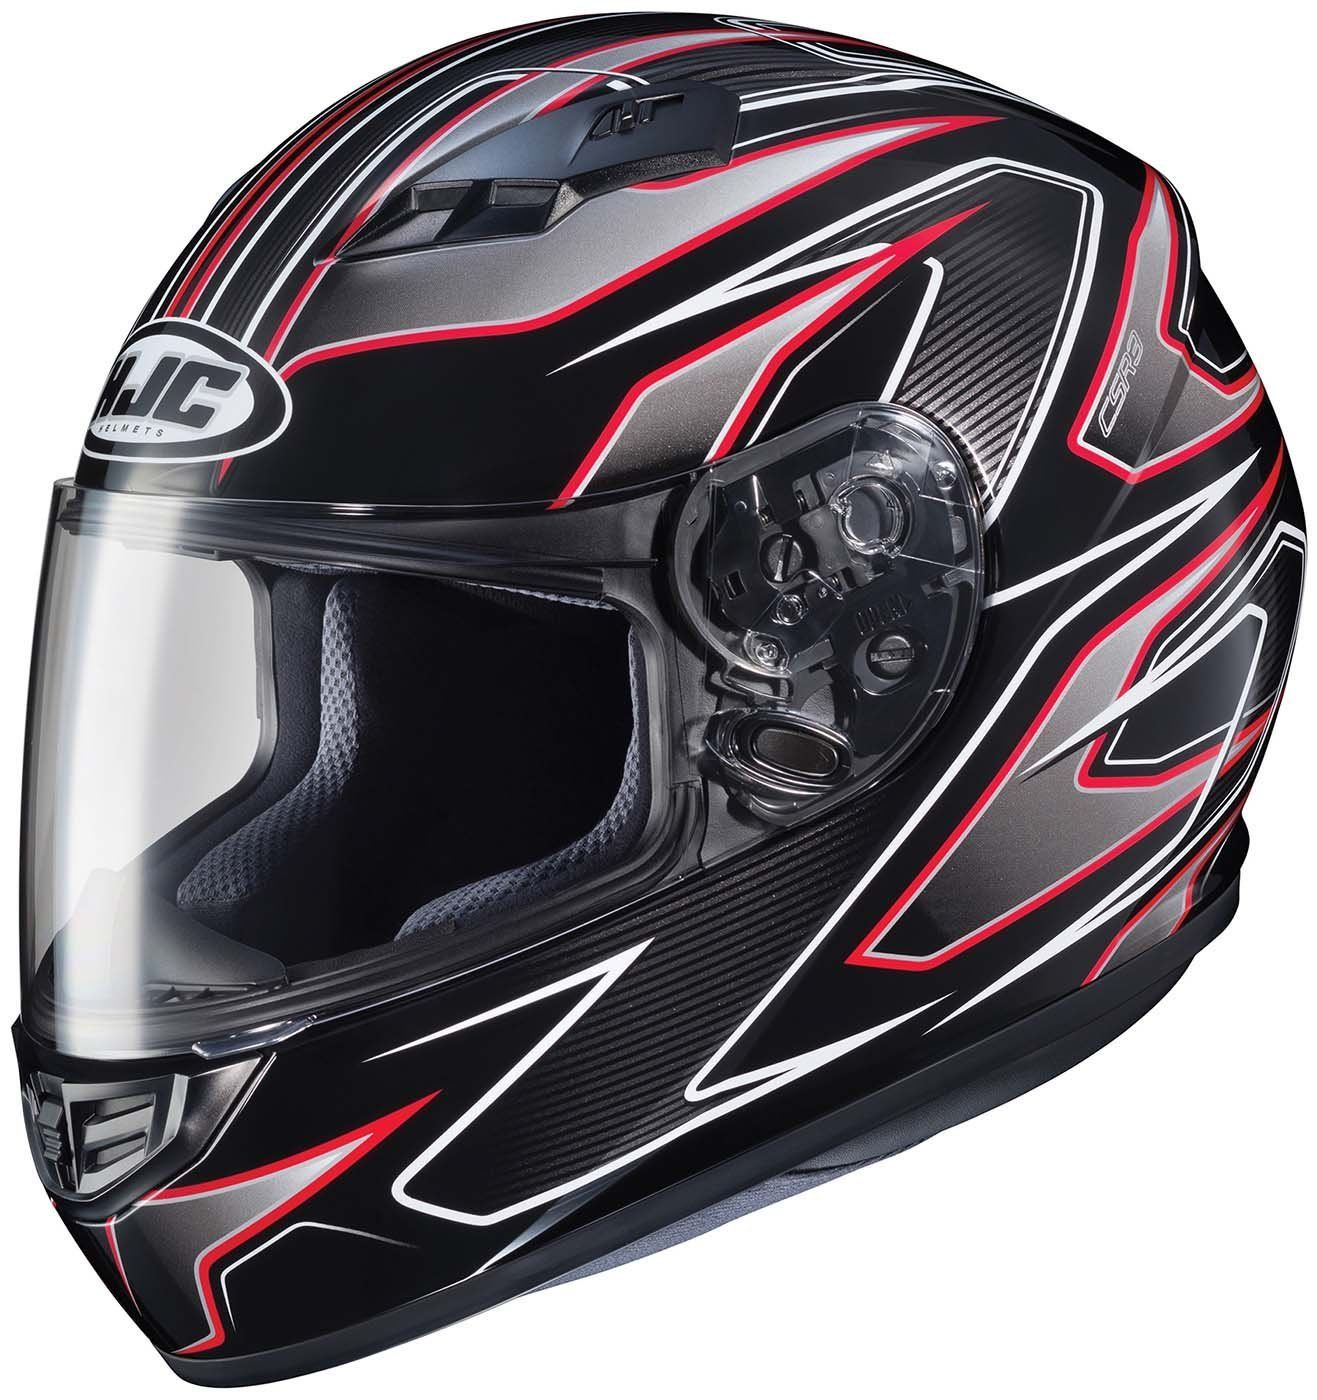 HJC HJC CS 15 TRION MC3HSF Motorcycle helmets